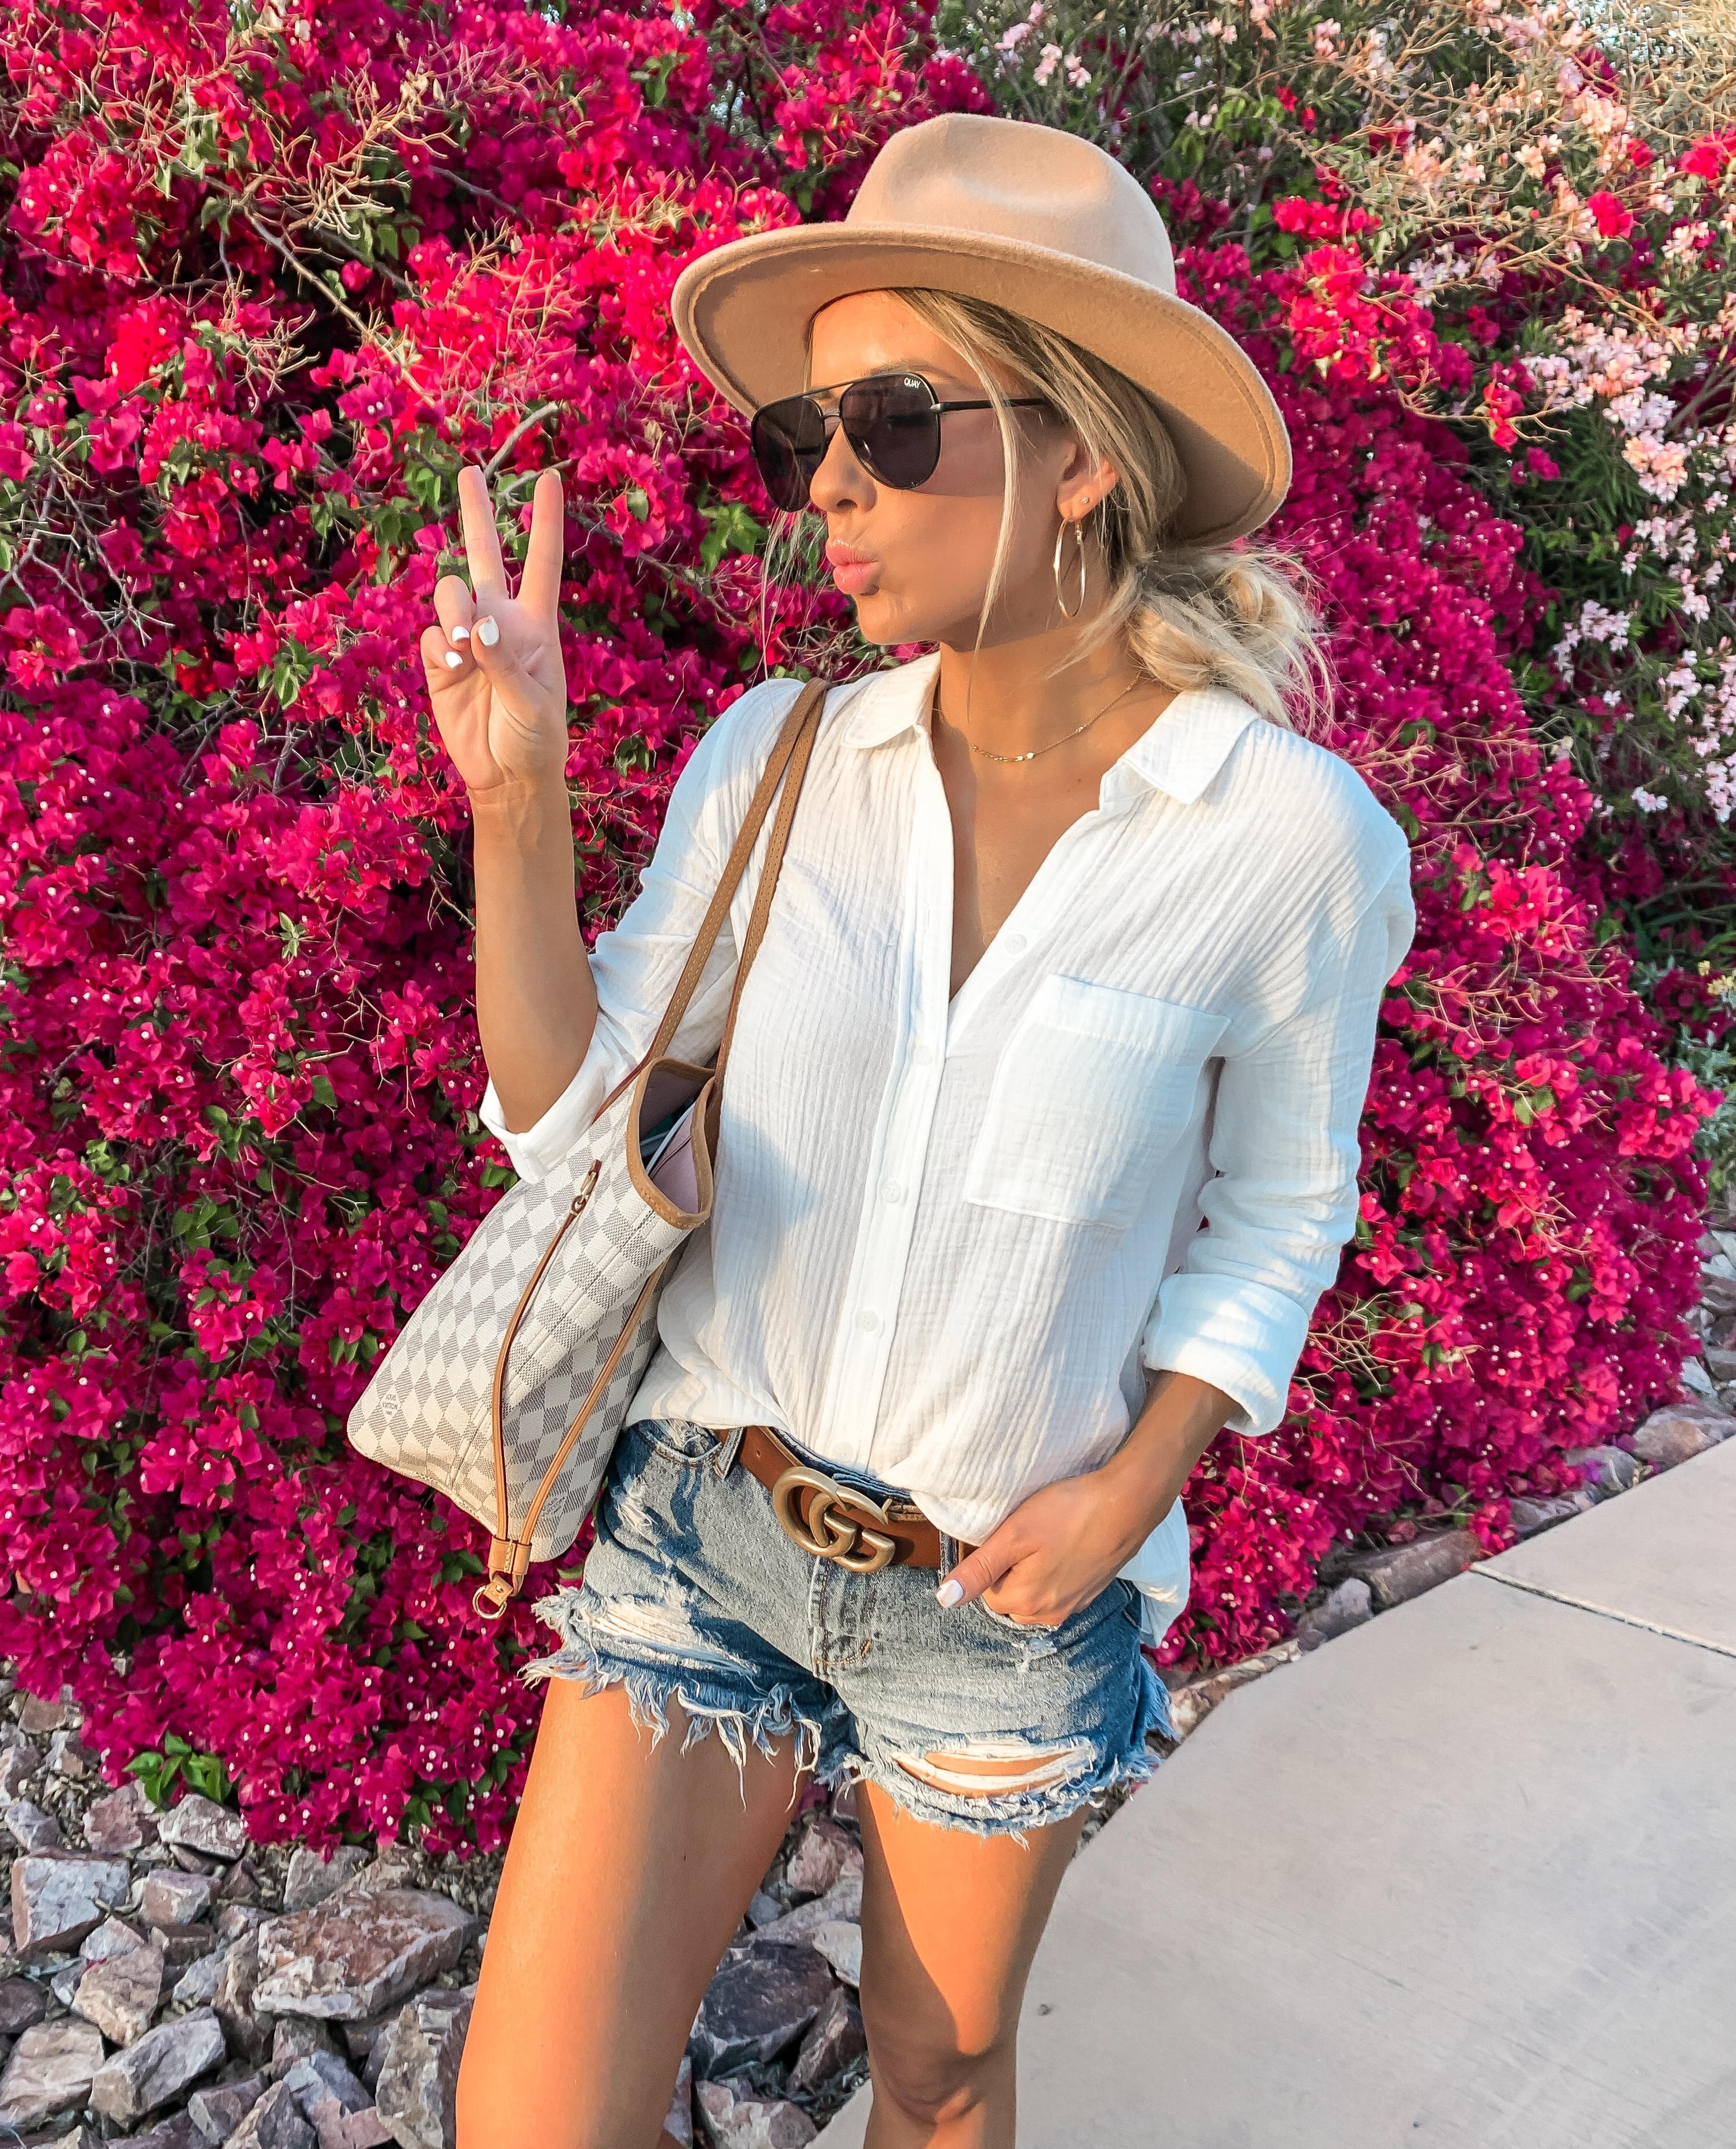 Casual comfy summer outfit idea Phoenix arizona white button down shirt cut off shorts brown gucci belt camel tan fedora hat Laura Beverlin 1